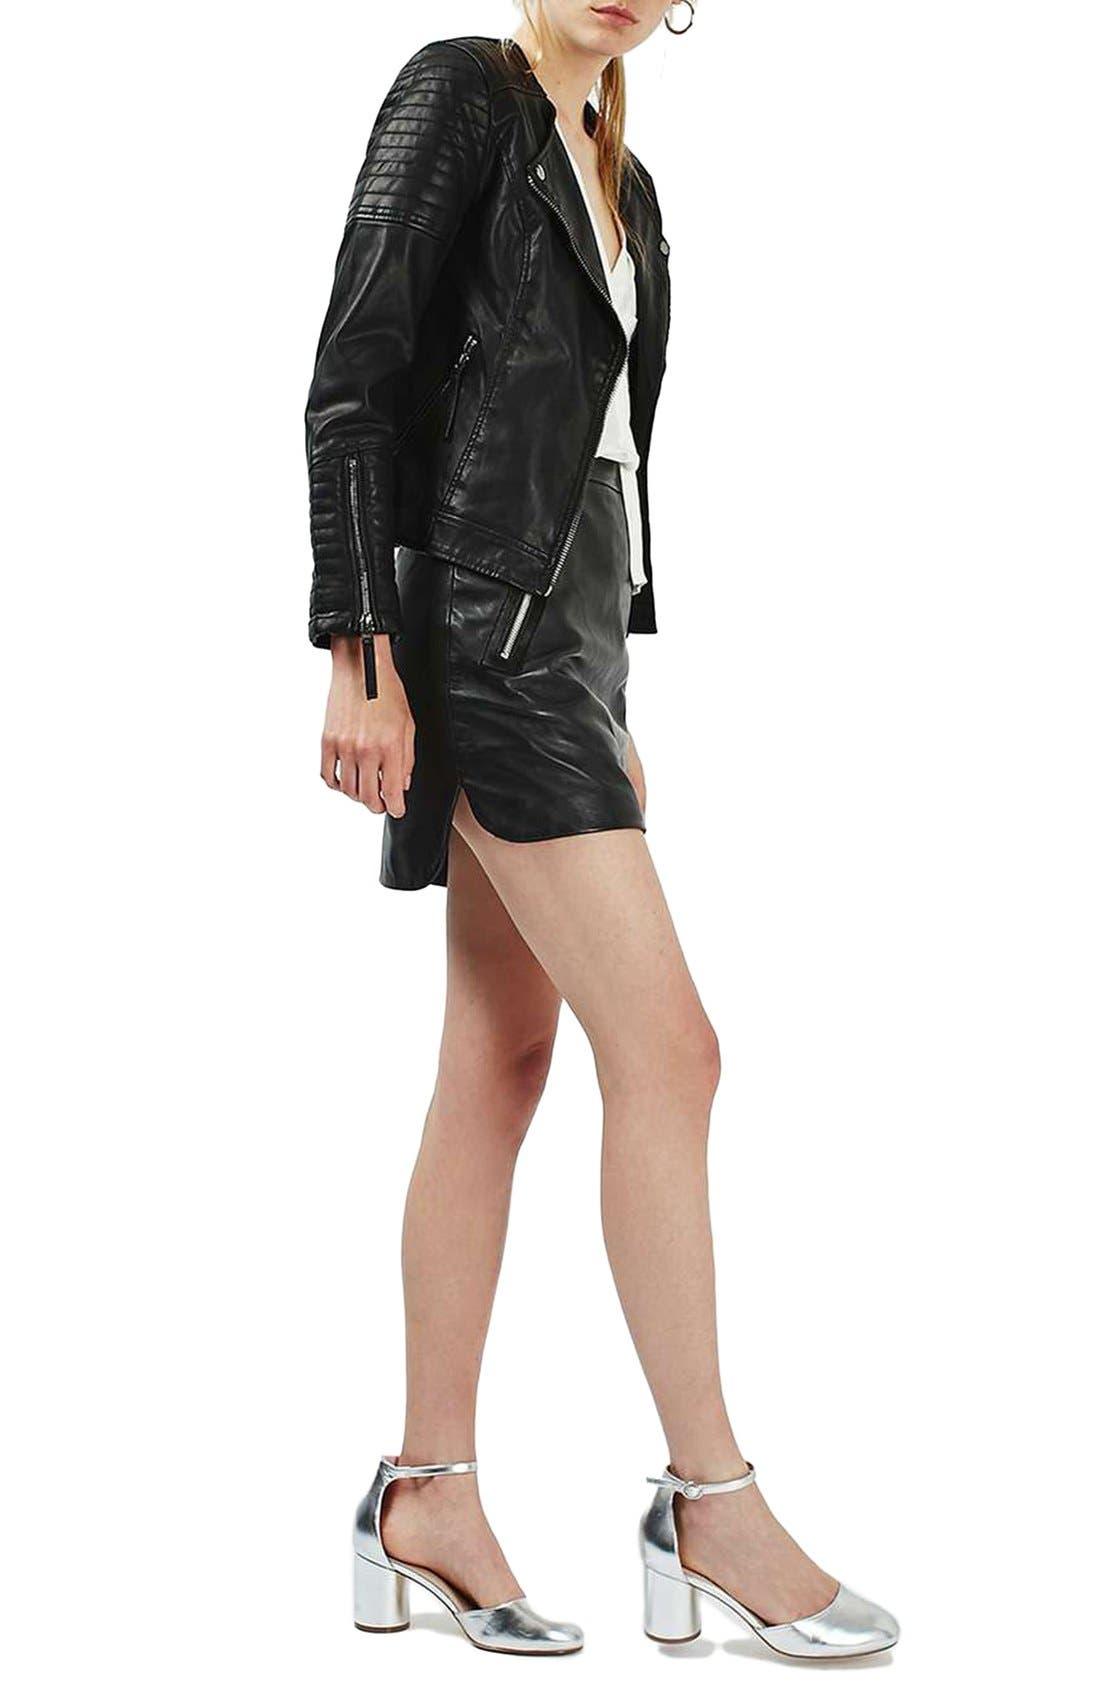 TOPSHOP, Nelly Faux Leather Biker Jacket, Alternate thumbnail 3, color, 001